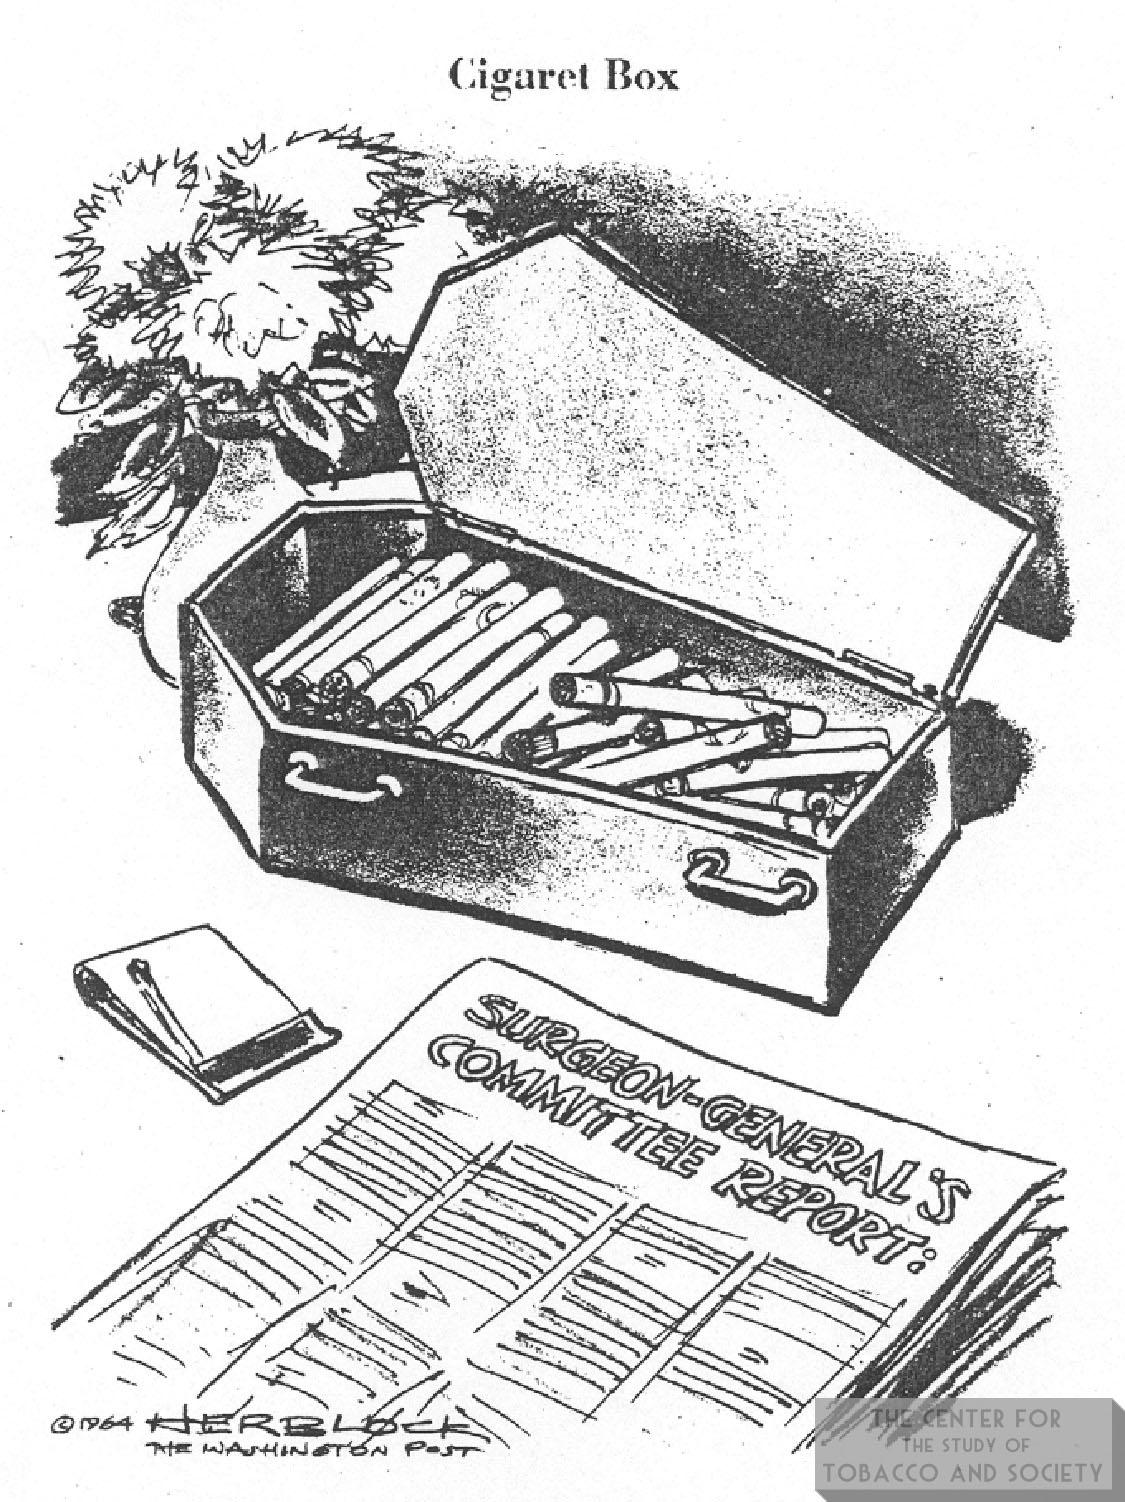 1964 Herblock Cartoon Coffin Cig Box